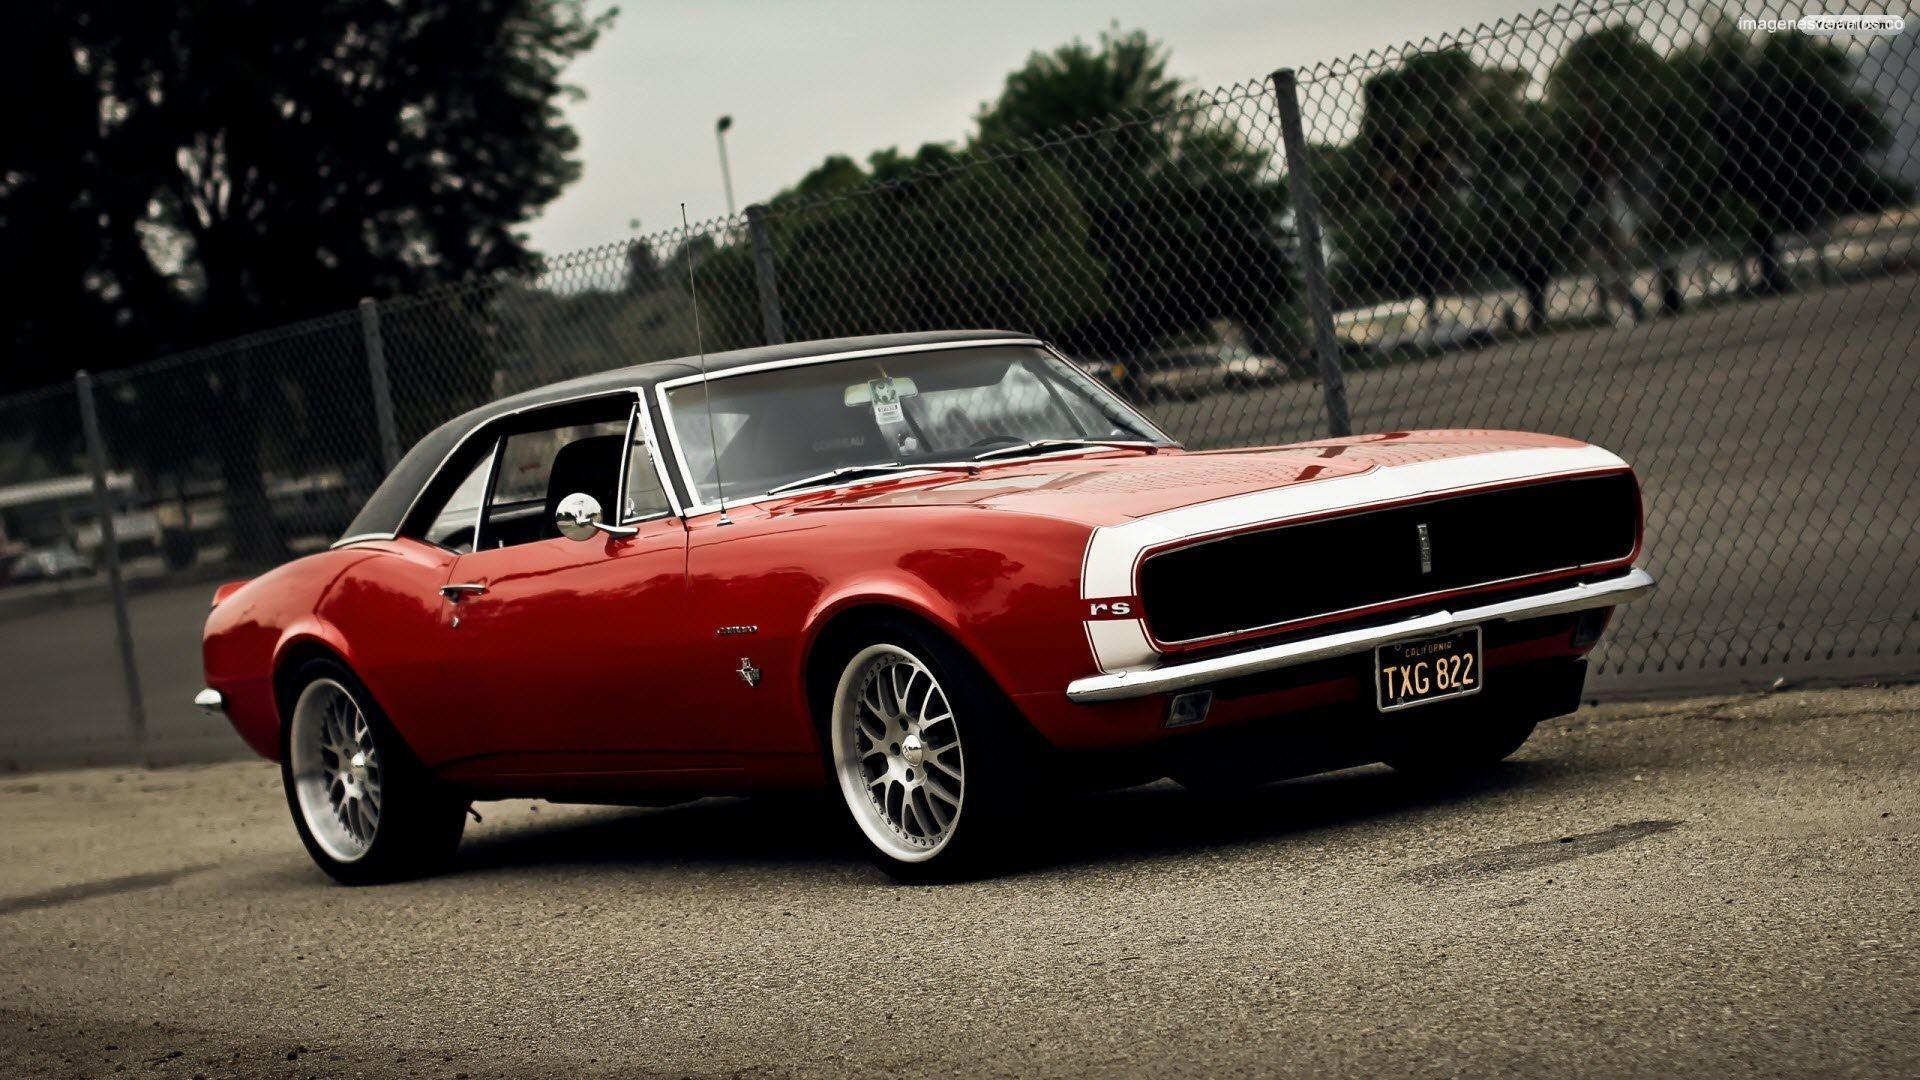 chevrolet camaro 1967 1366 768